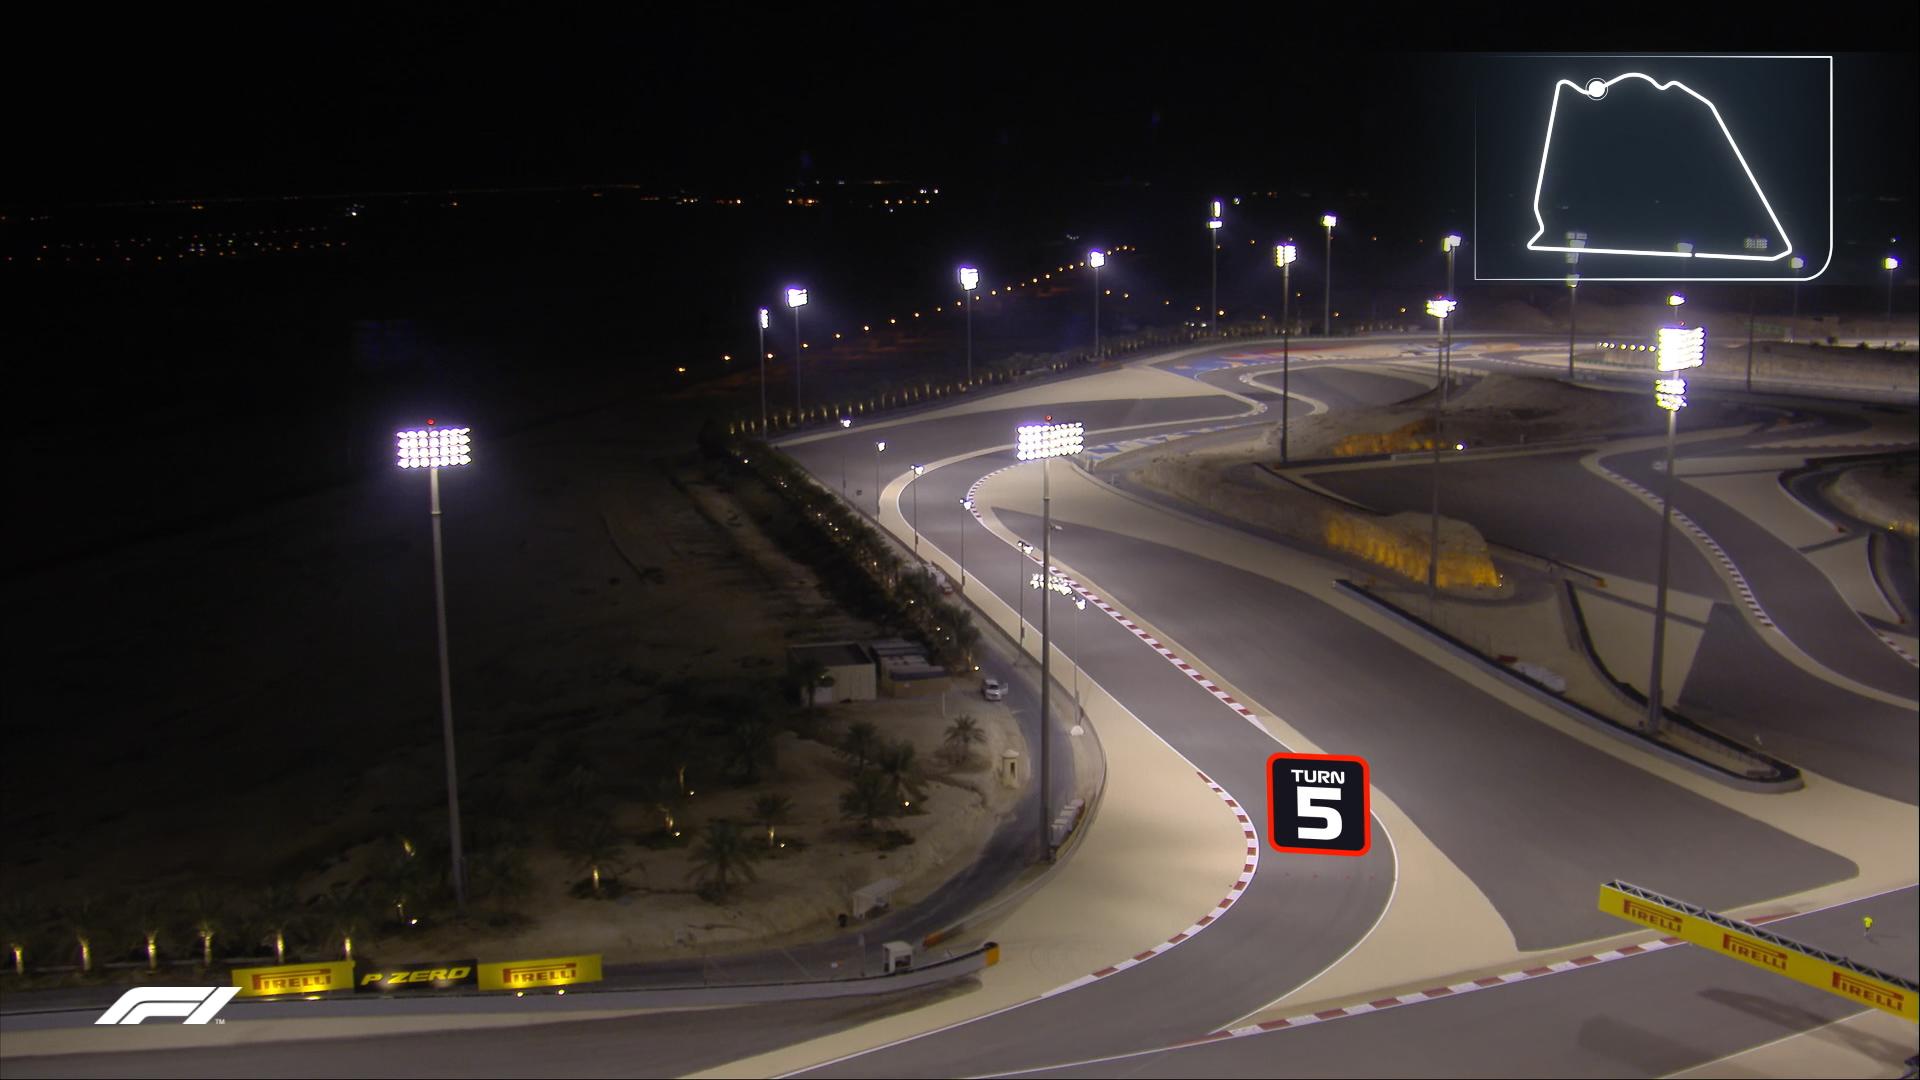 Bird's eye view: Bahrain International Circuit's outer track corner by corner